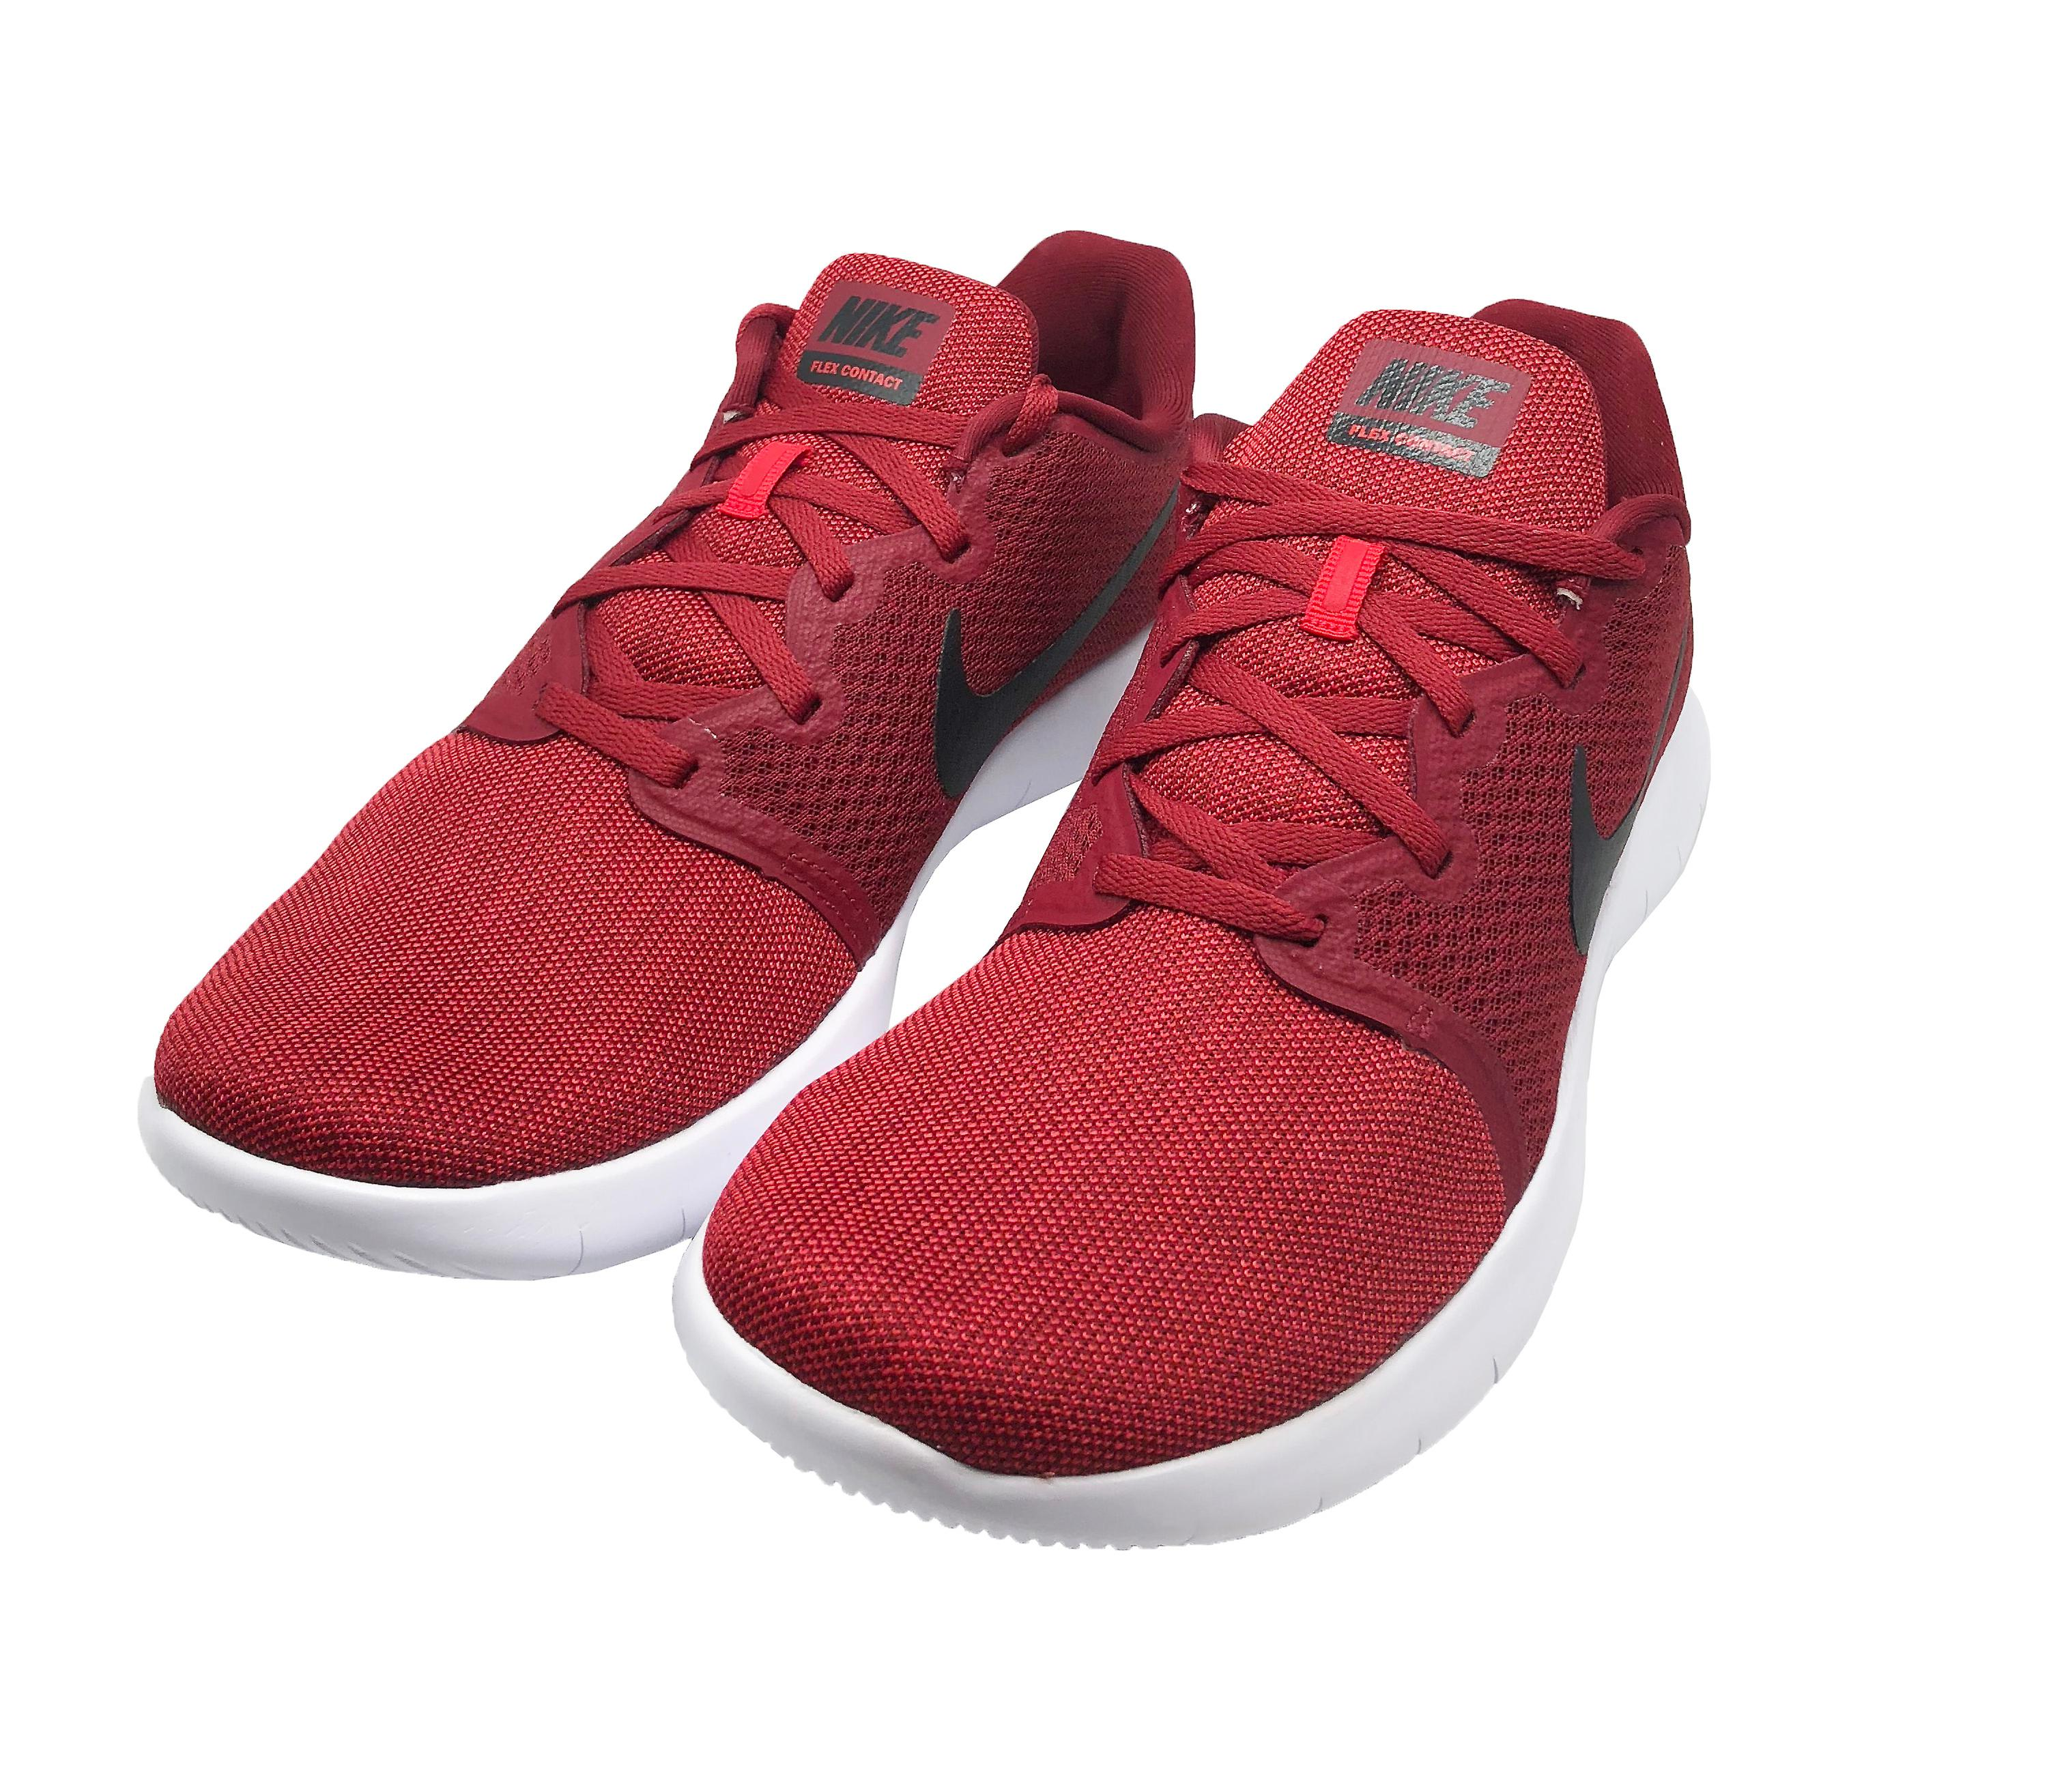 Nike Flex kontakt AA7398 601 Mens utbildare